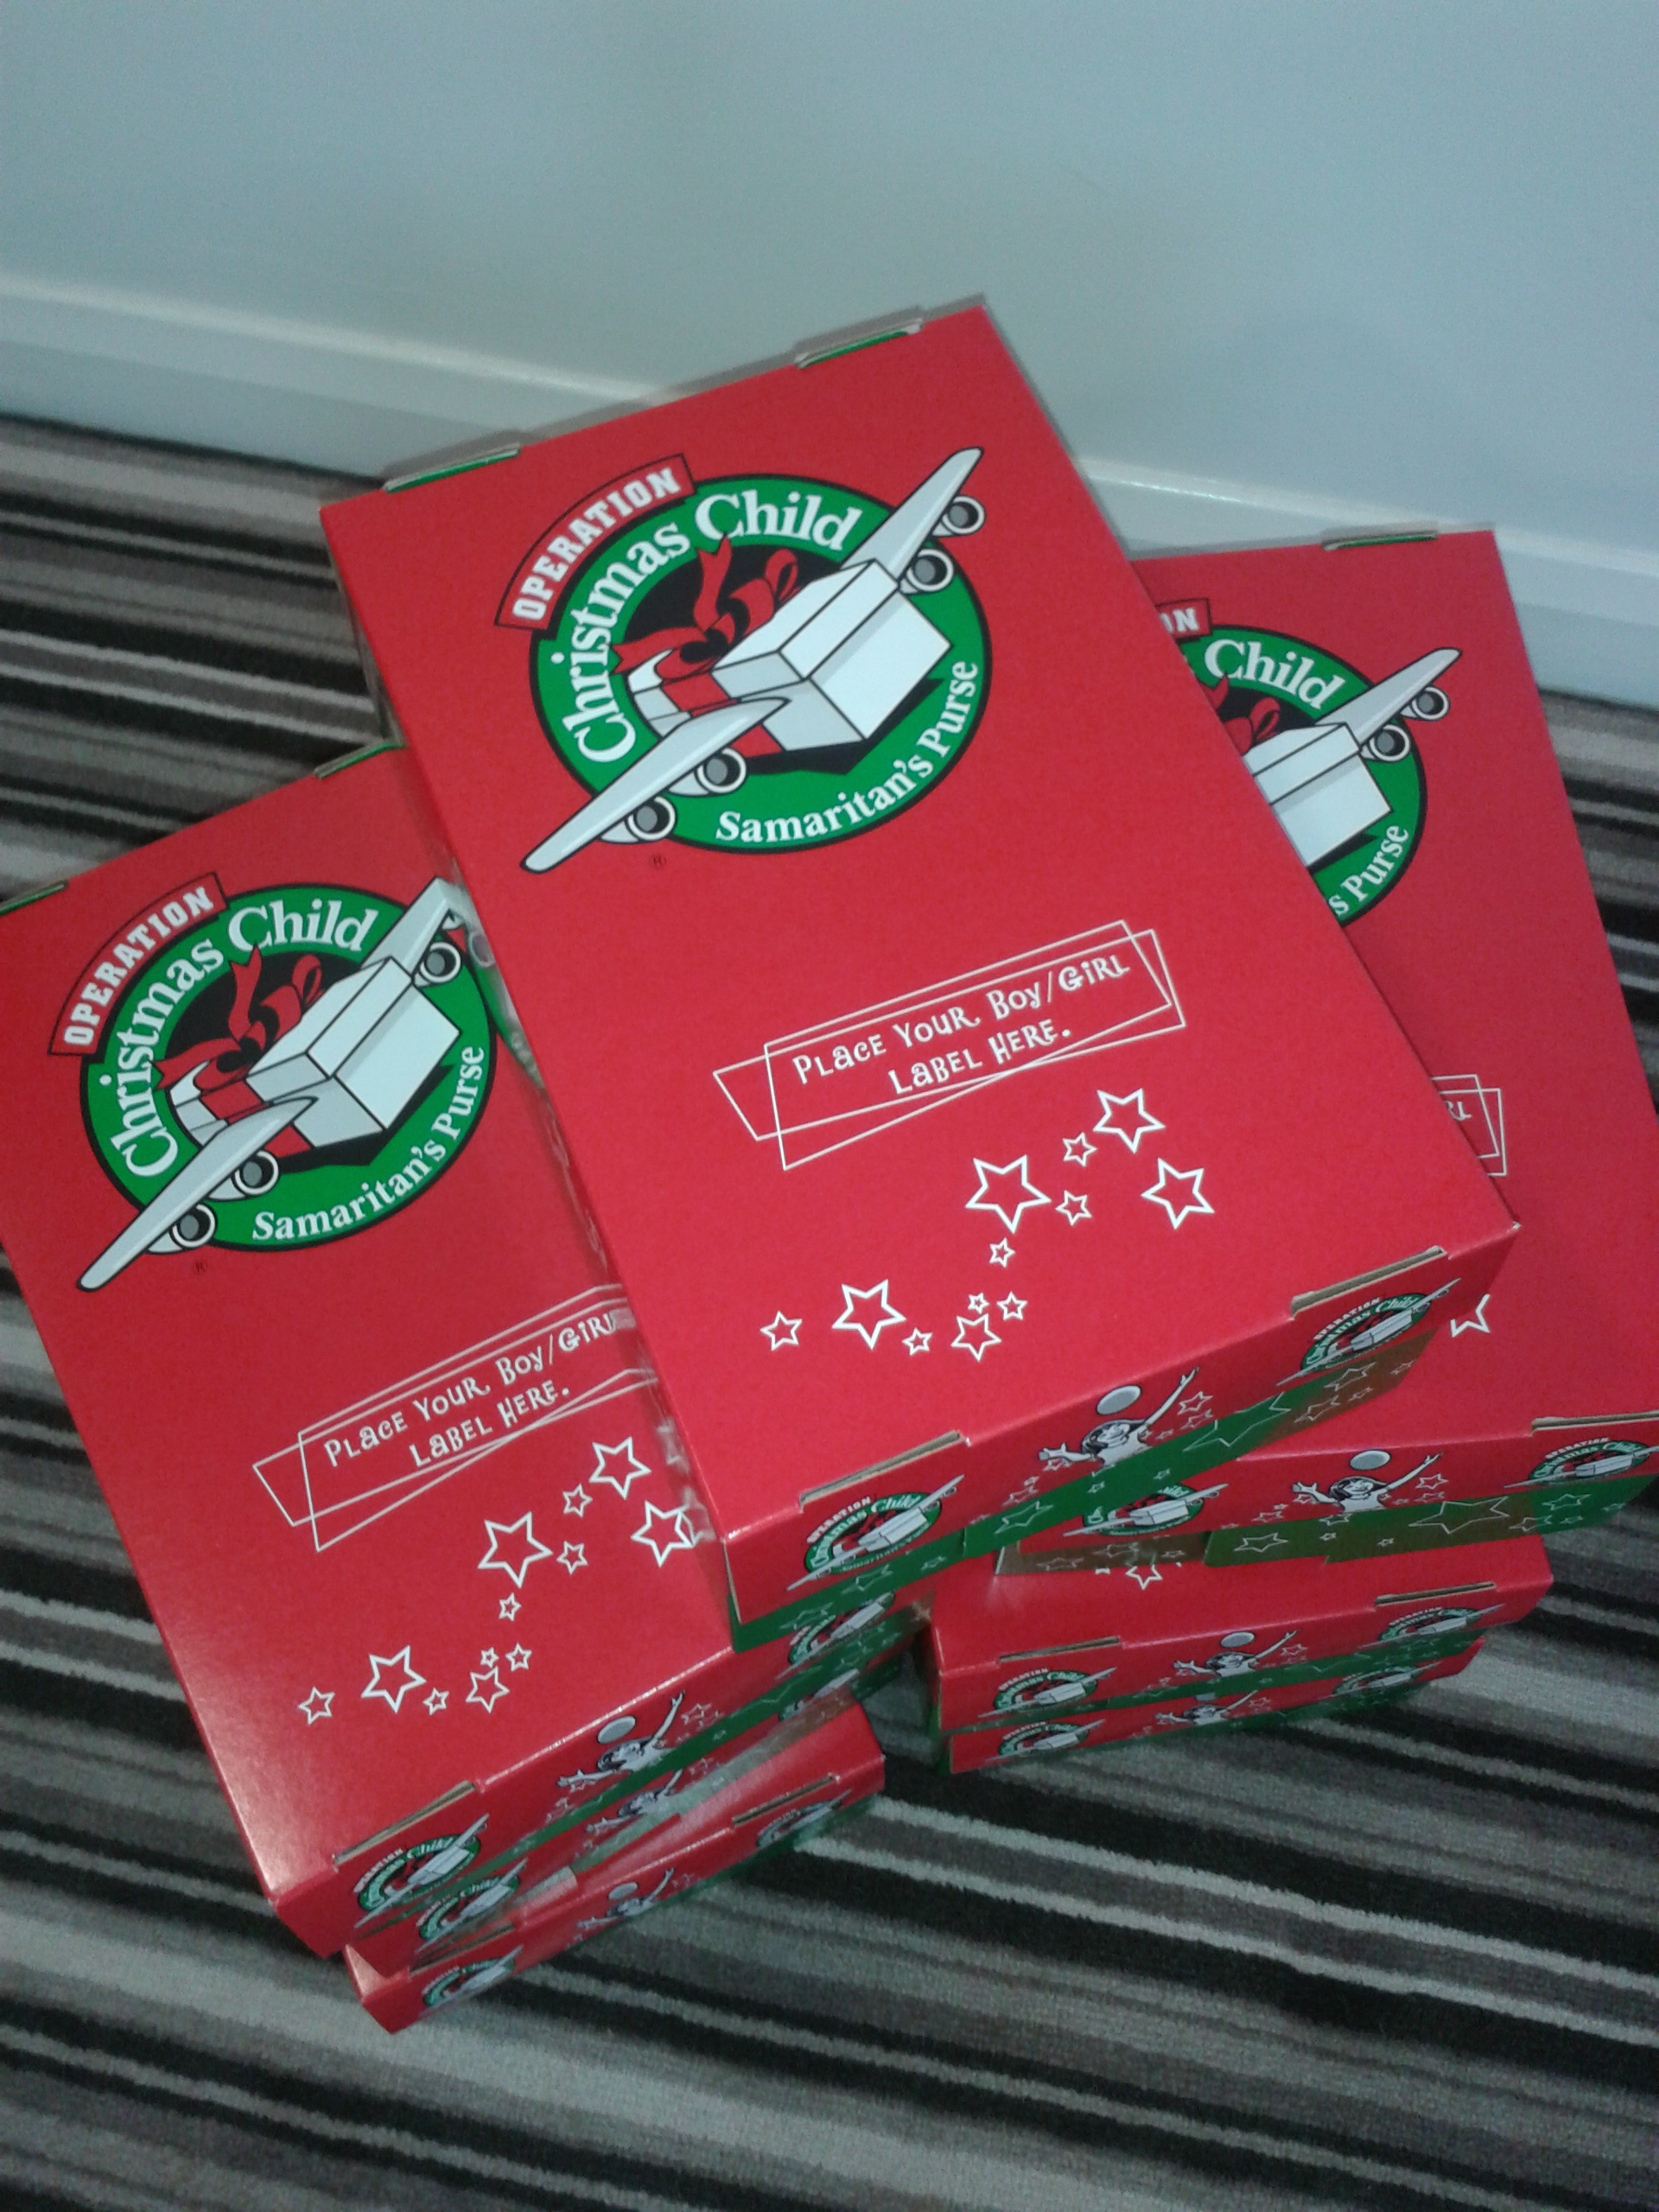 Christmas Shoe Box Appeal.Operation Christmas Child Shoe Box Appeal 2014